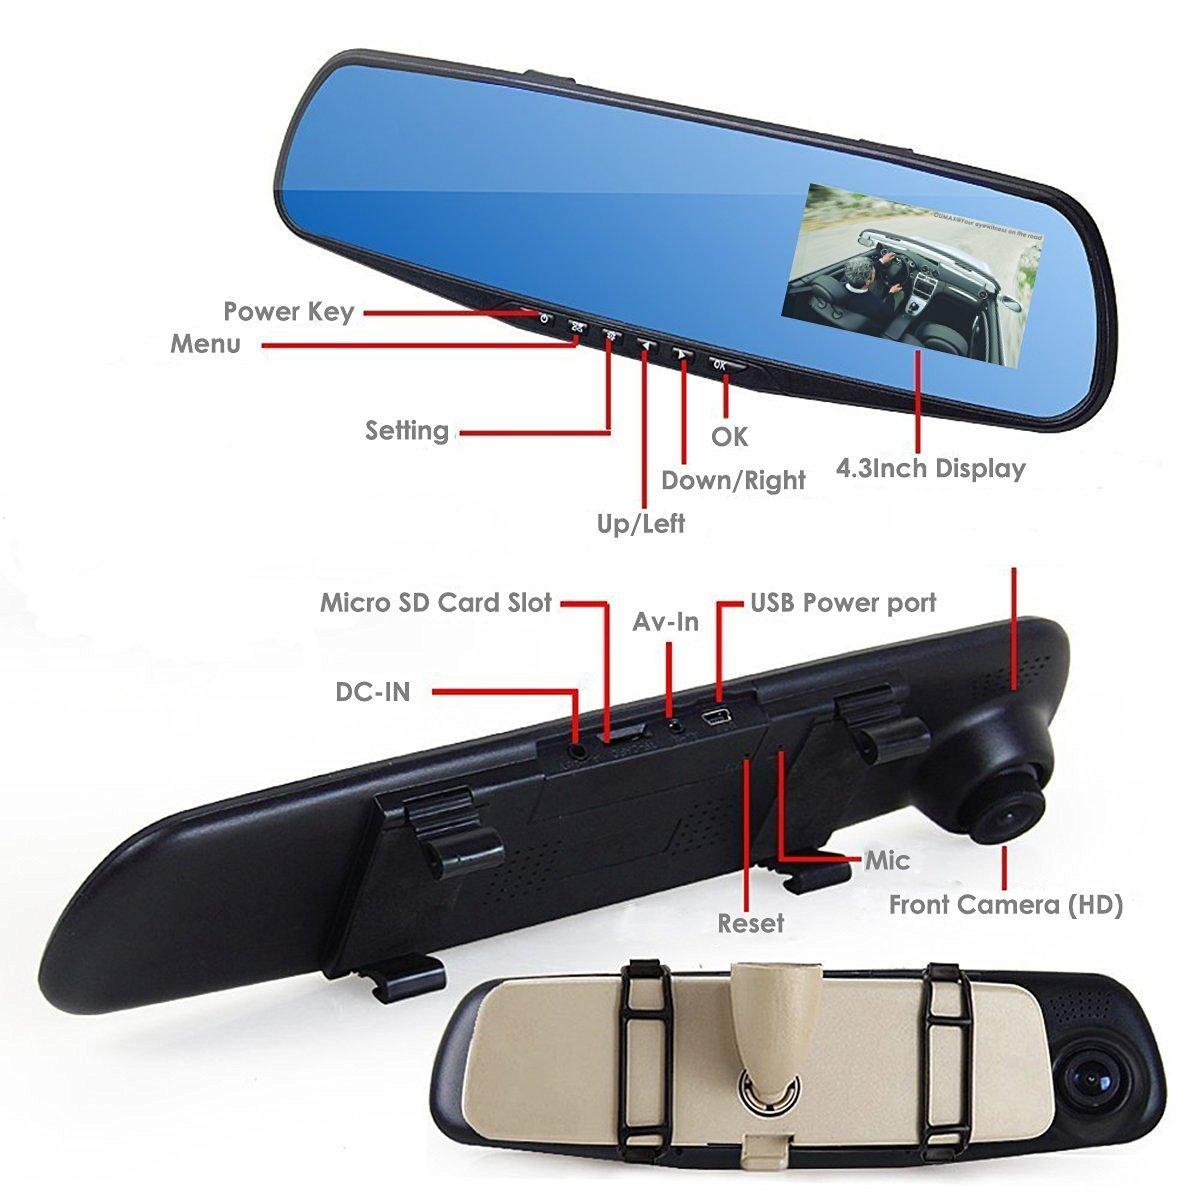 Inredning ok hyra lastbil : Amazon.com: 4.3 inch 1080P Dash Cam Dual Lens FHD Rearview Mirror ...